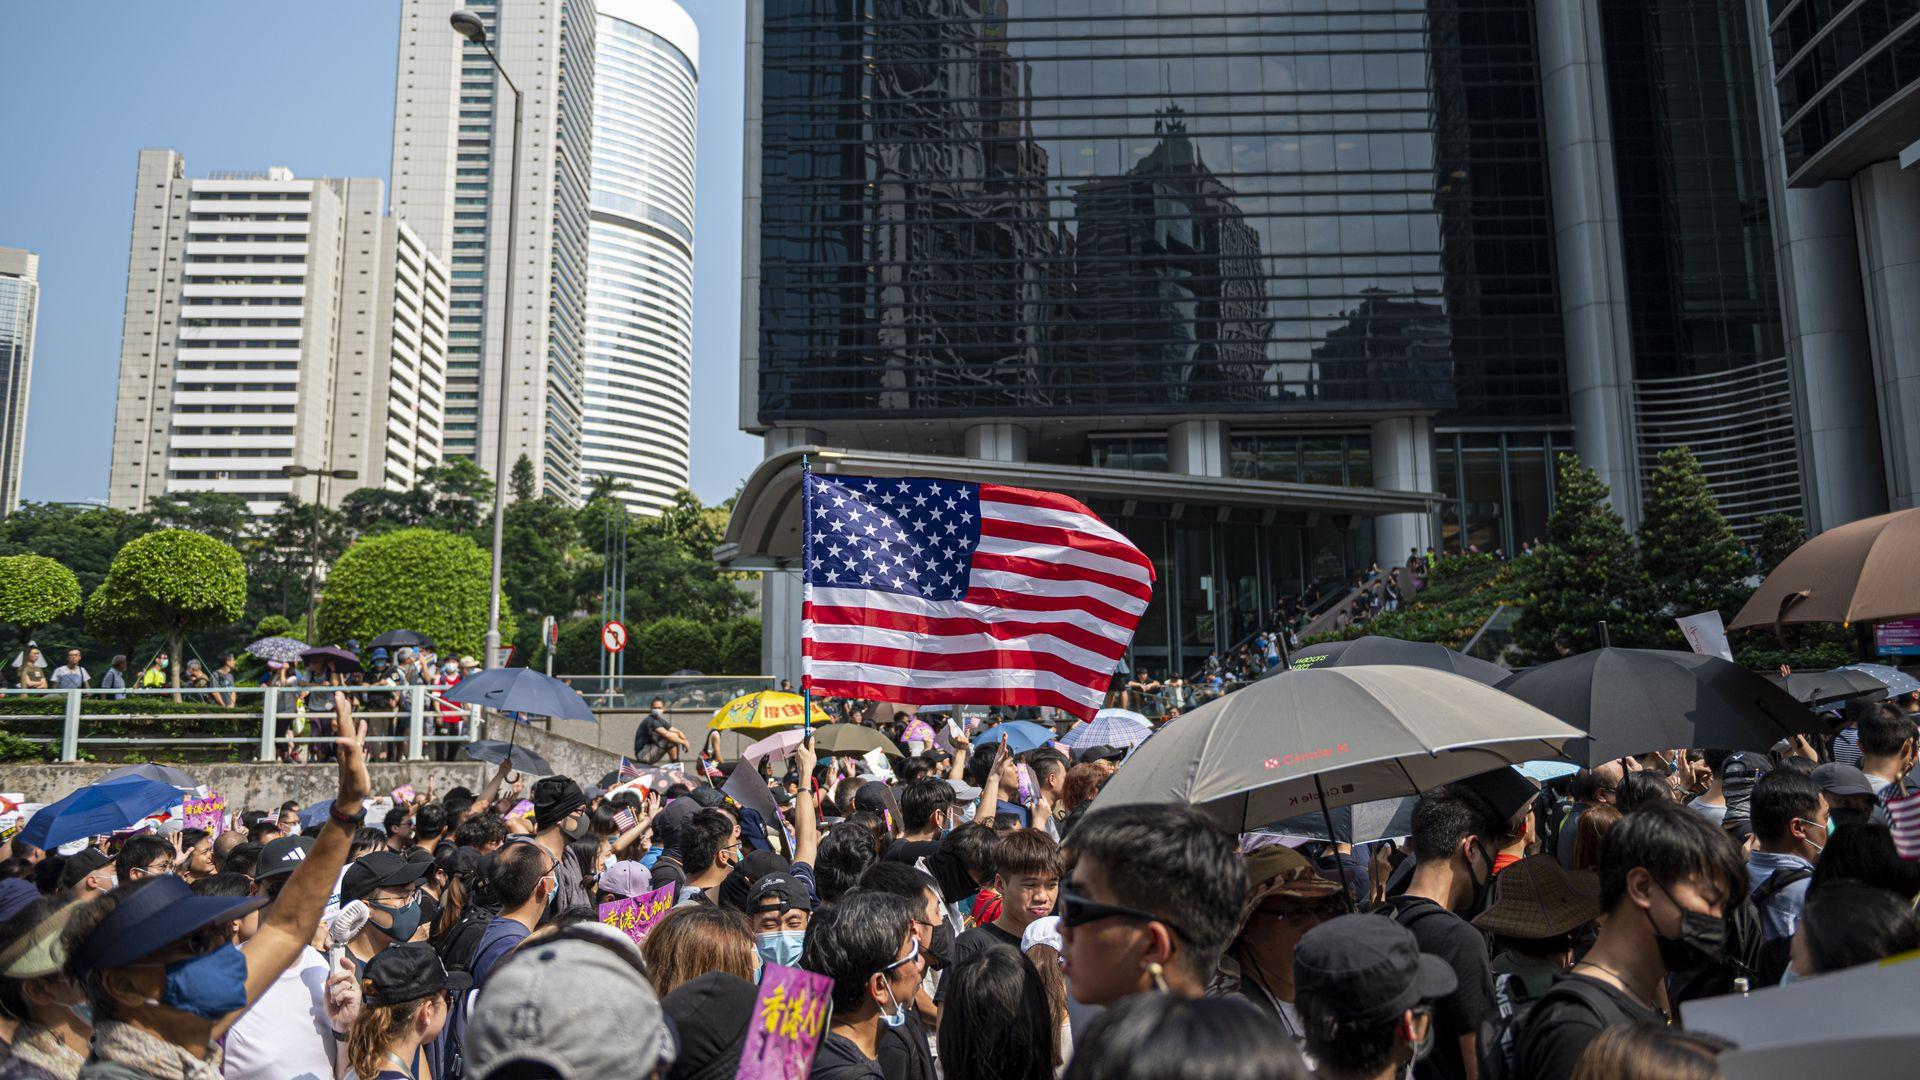 China threatens U.S. it will retaliate if Hong Kong bill becomes law